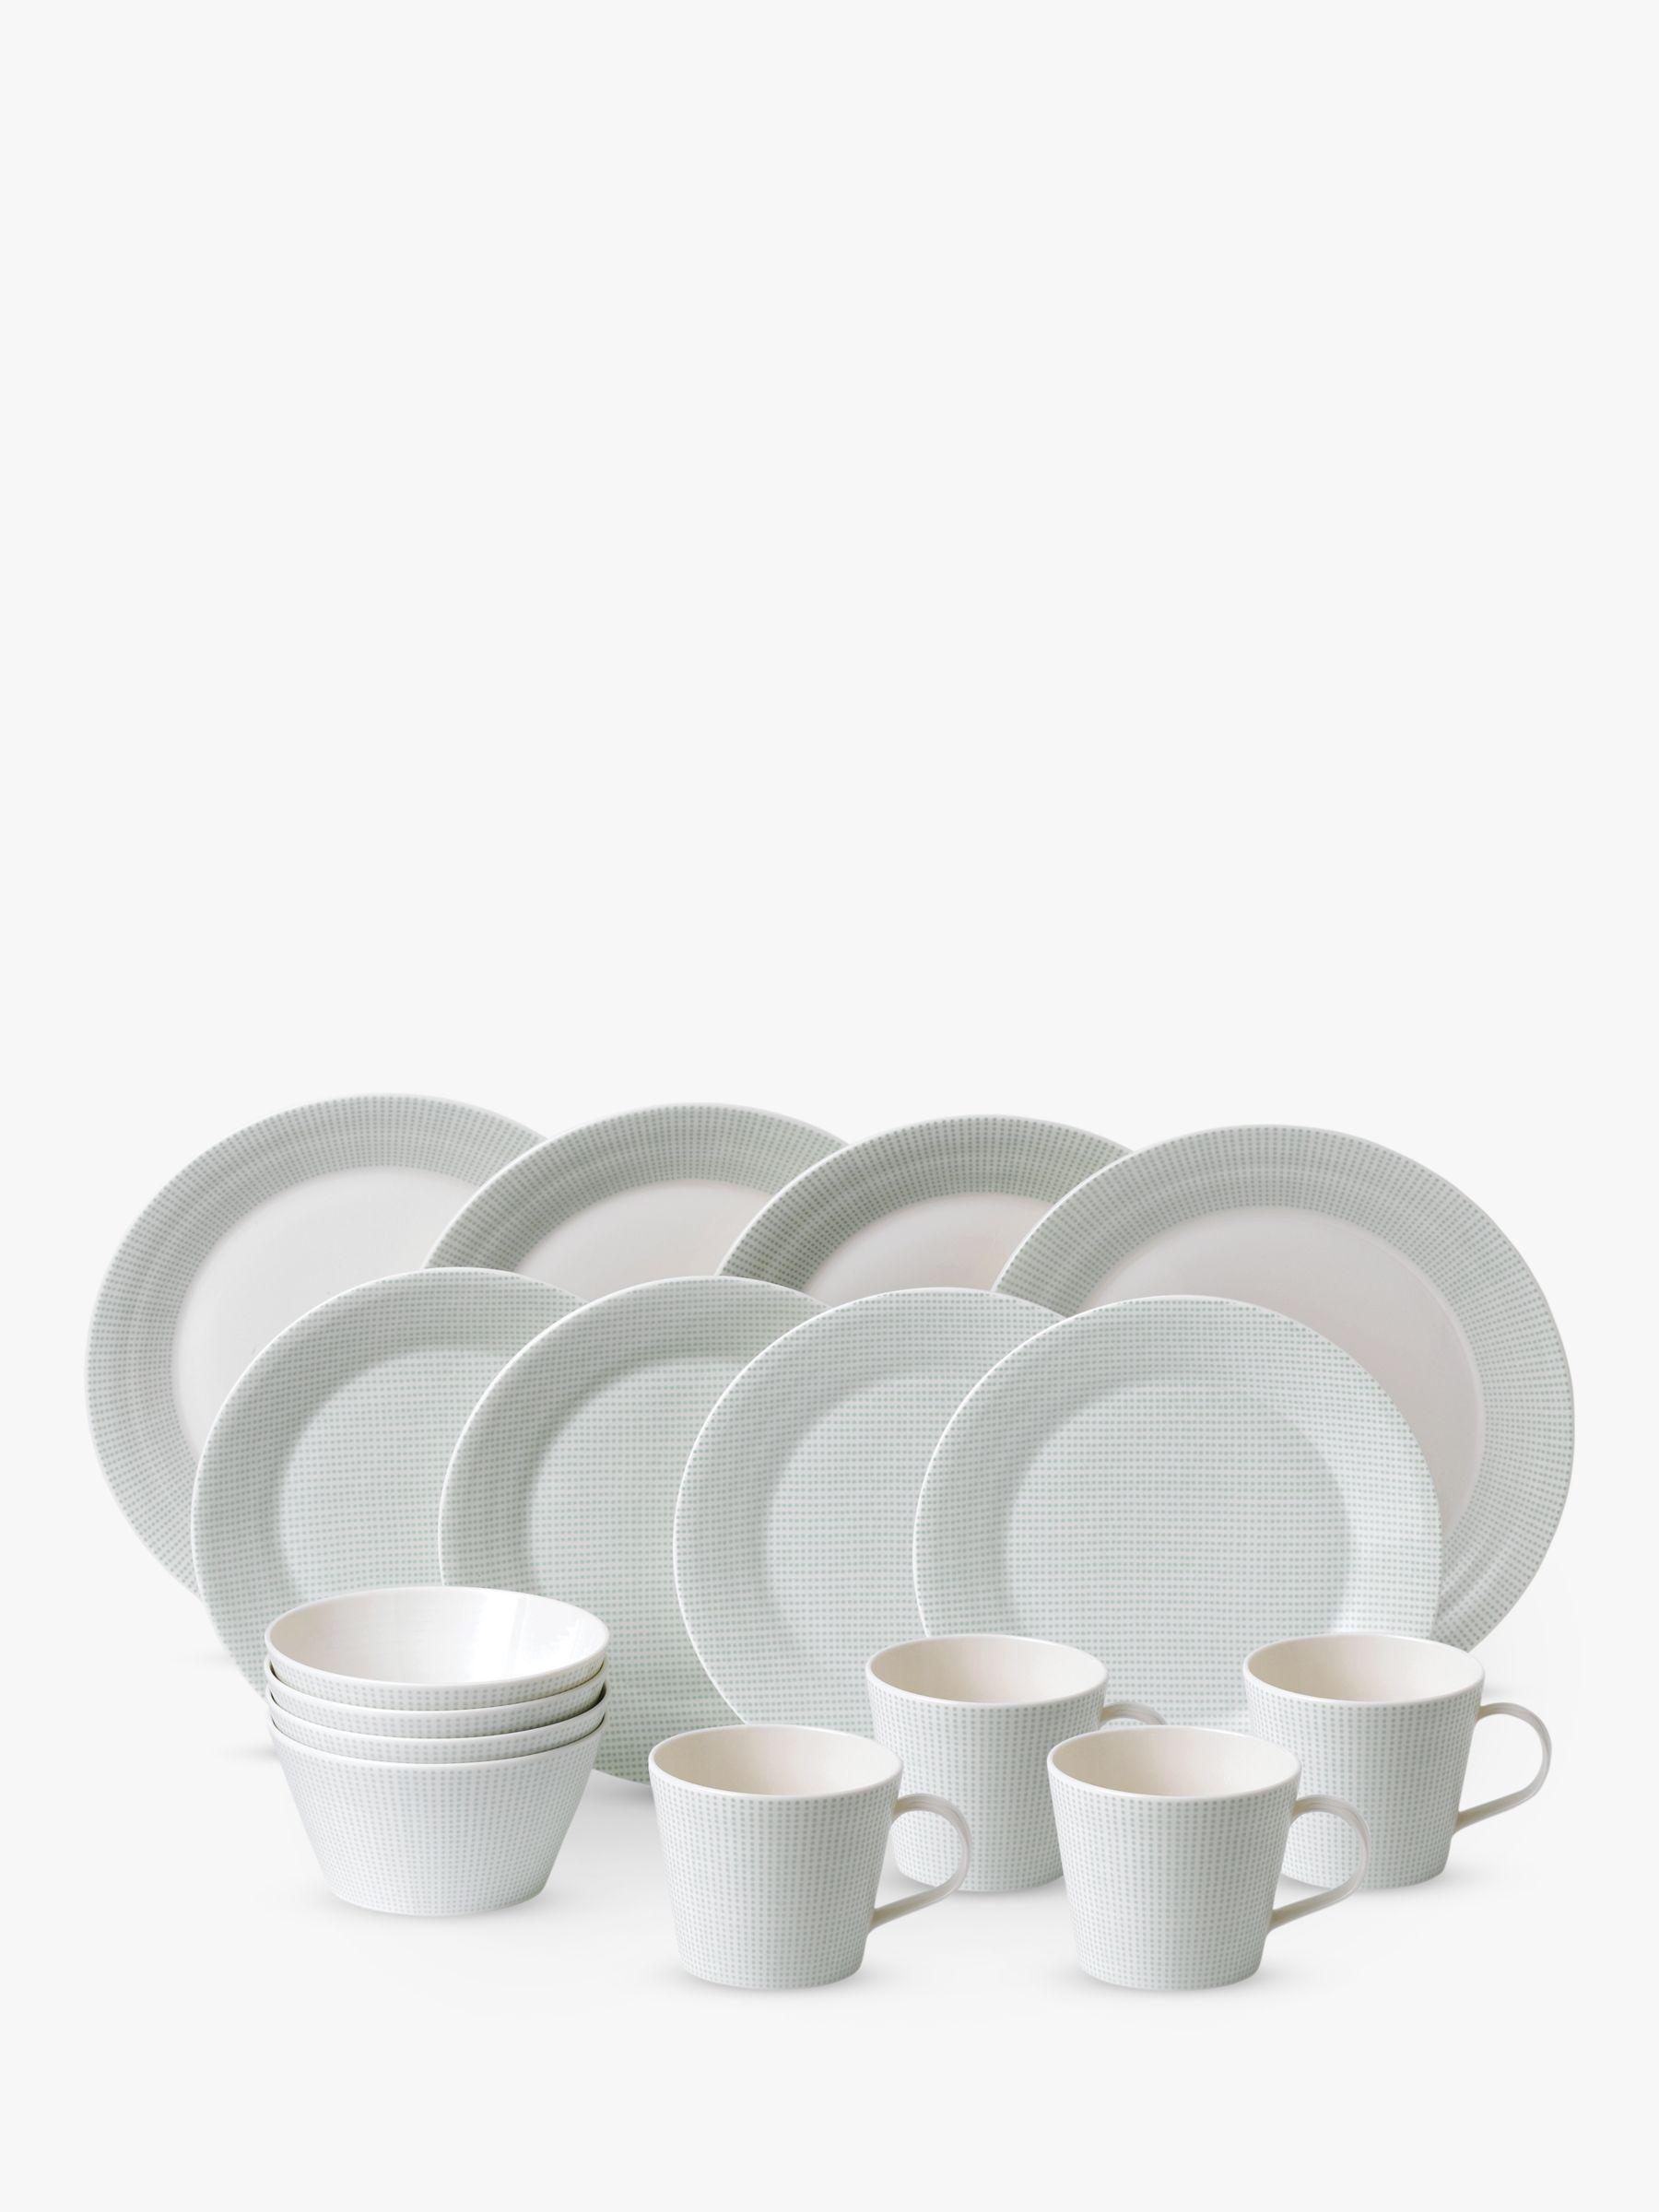 Royal Doulton Royal Doulton Pacific Porcelain China Dinnerware Set, 16 Piece, Mint